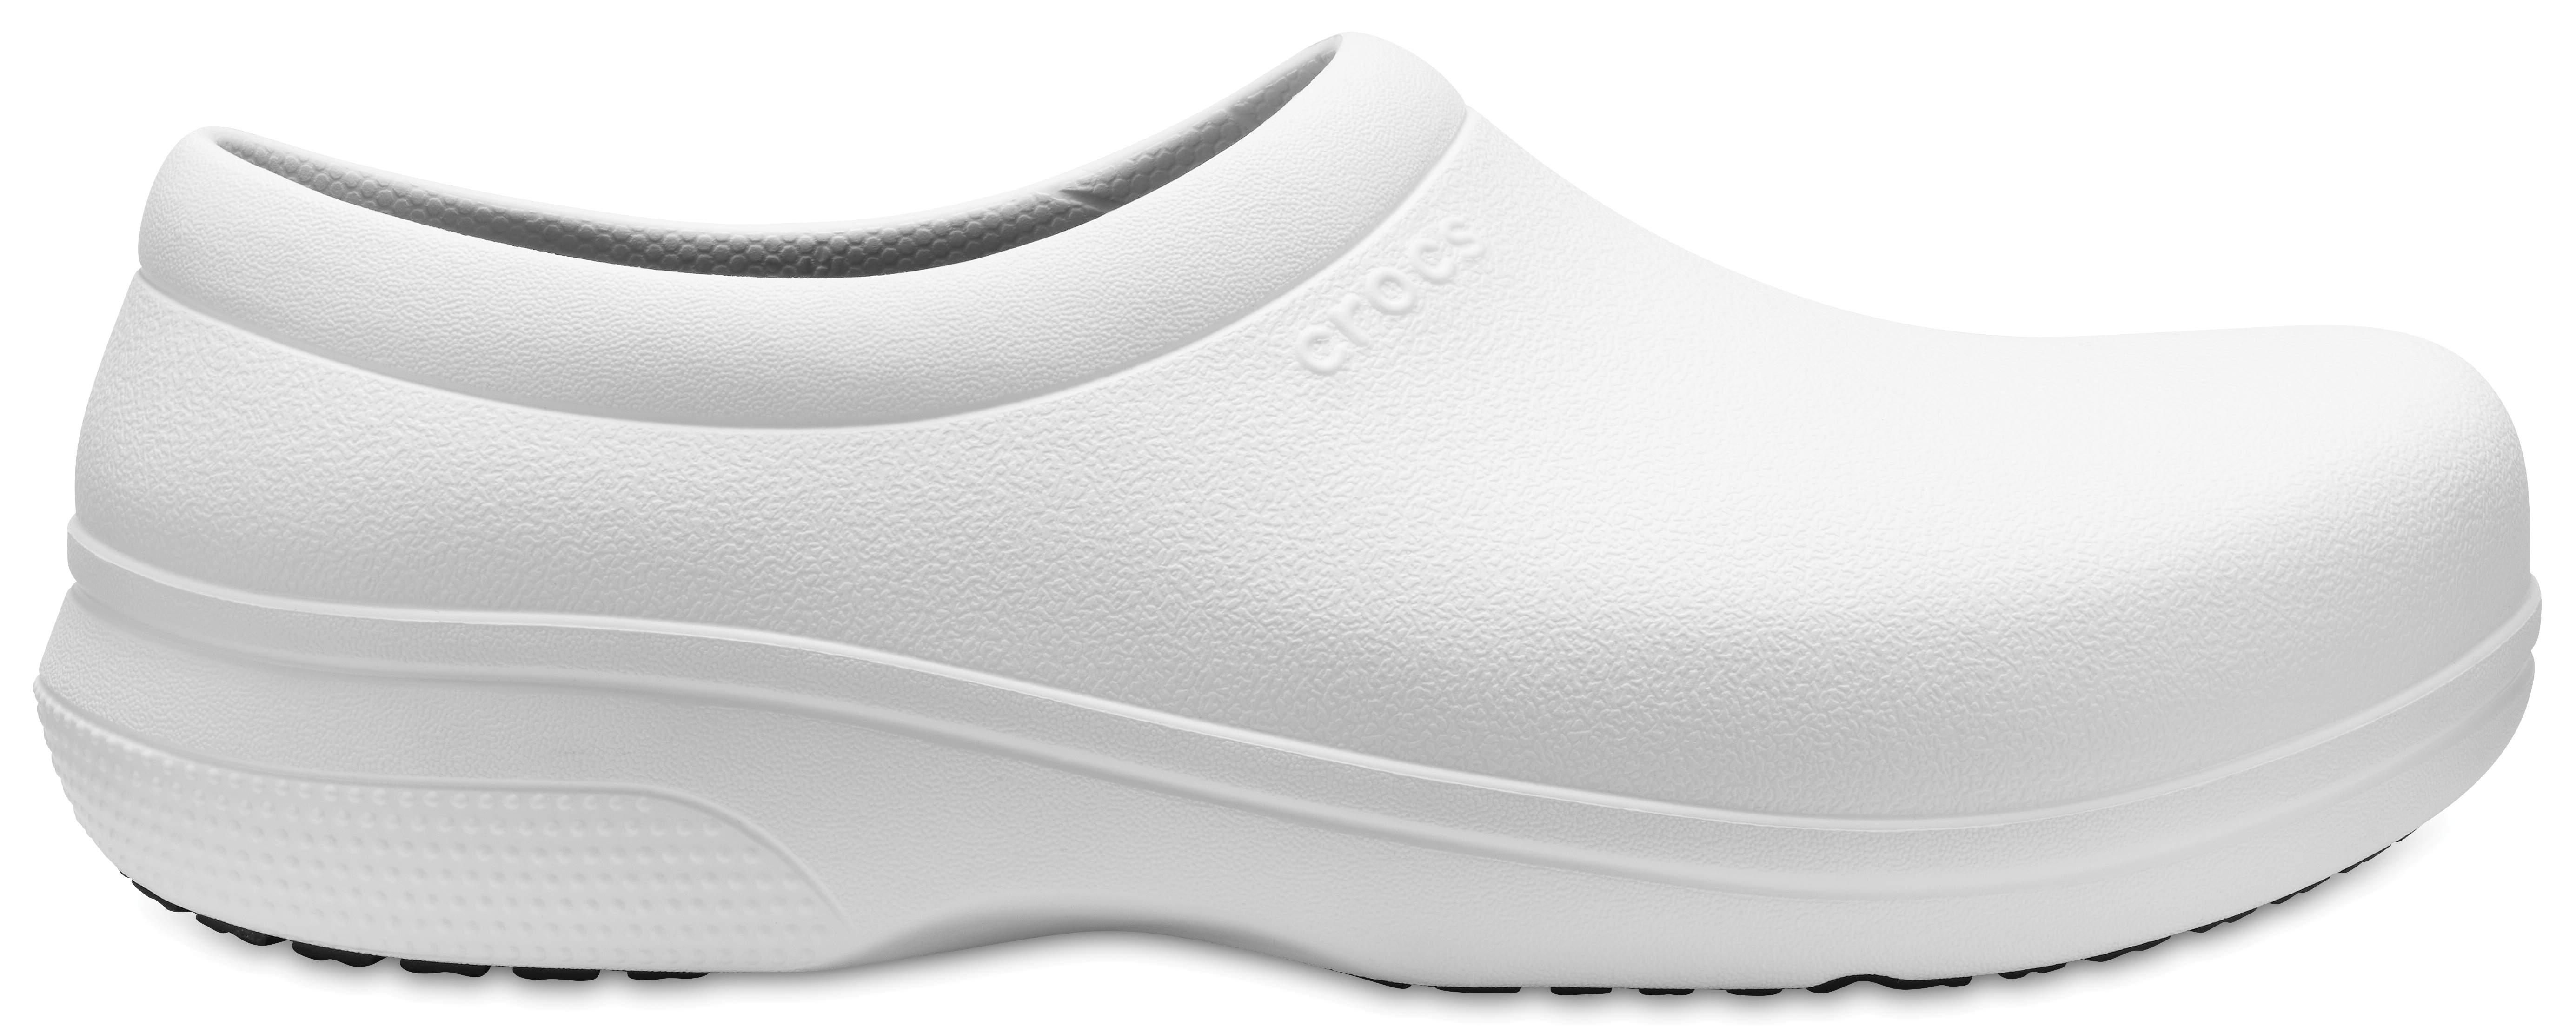 Zapato Sloan para mujer, Blue Steel, 7,5 M EE. UU.